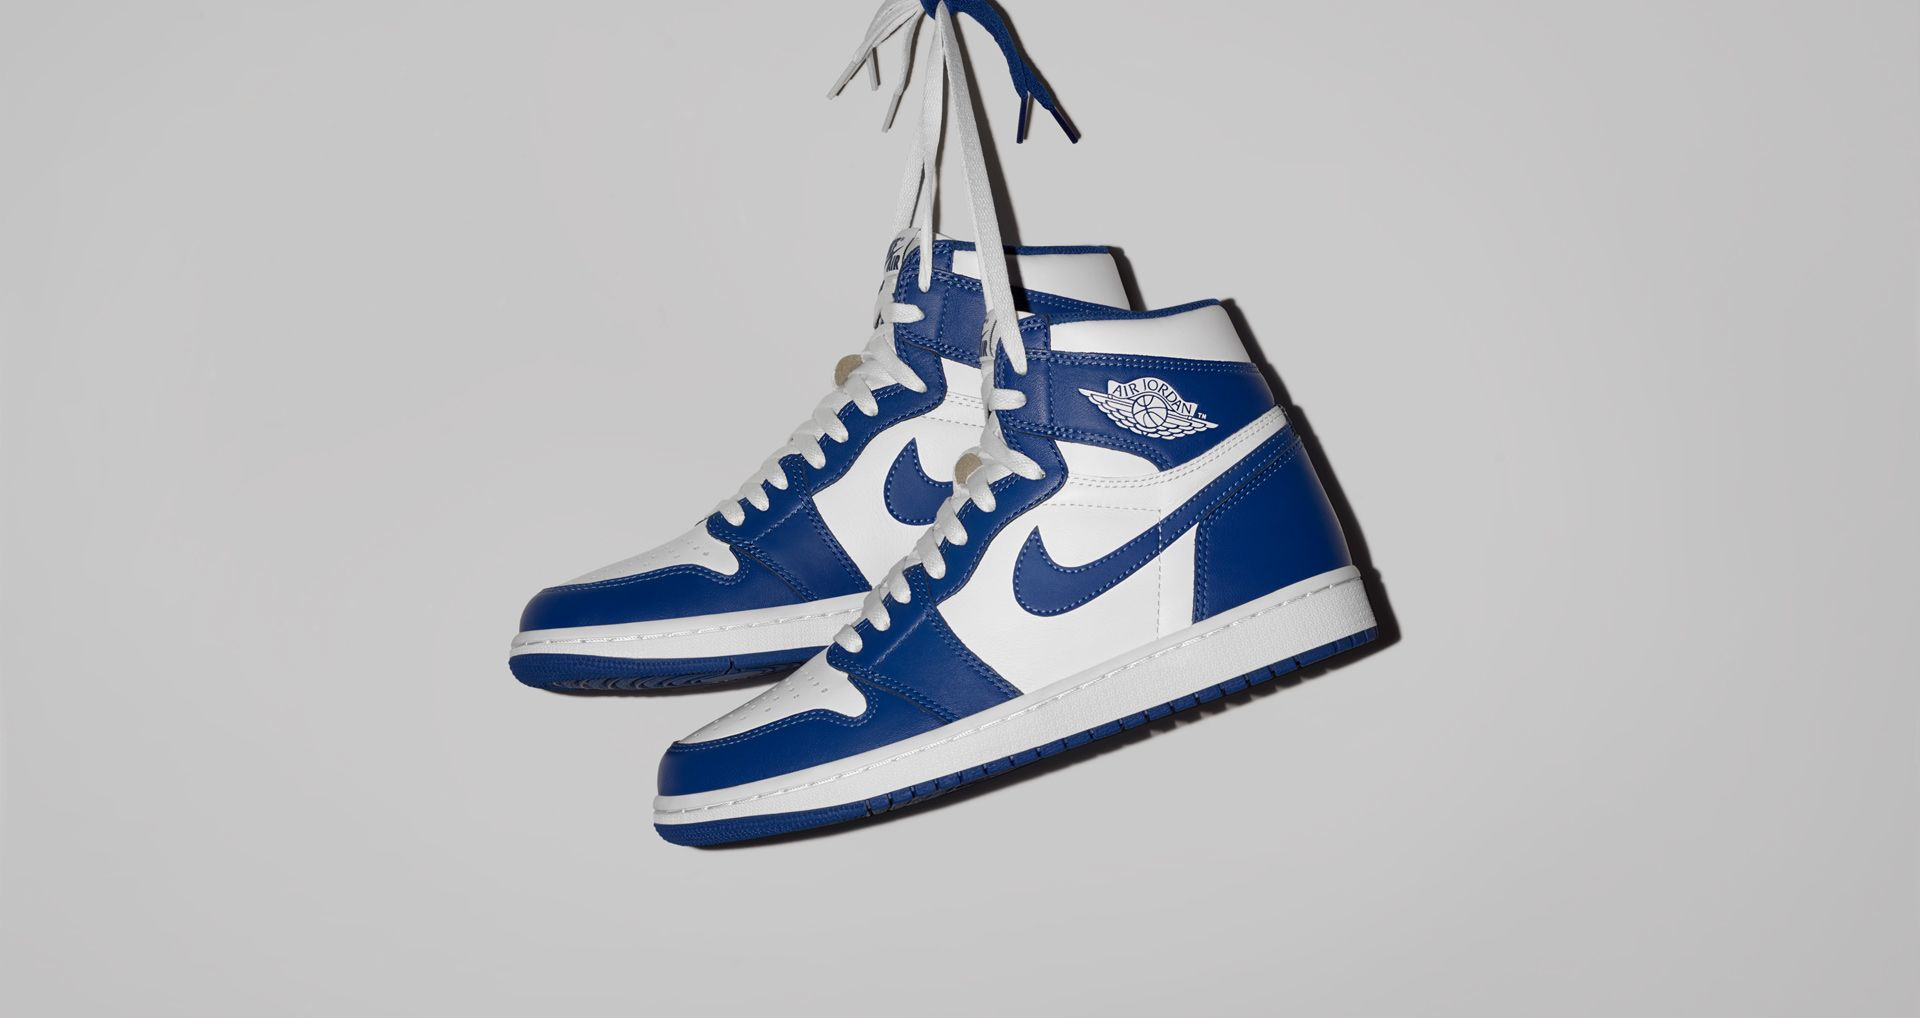 13f03309889 Air Jordan 1 Retro  Storm Blue . Nike+ SNKRS